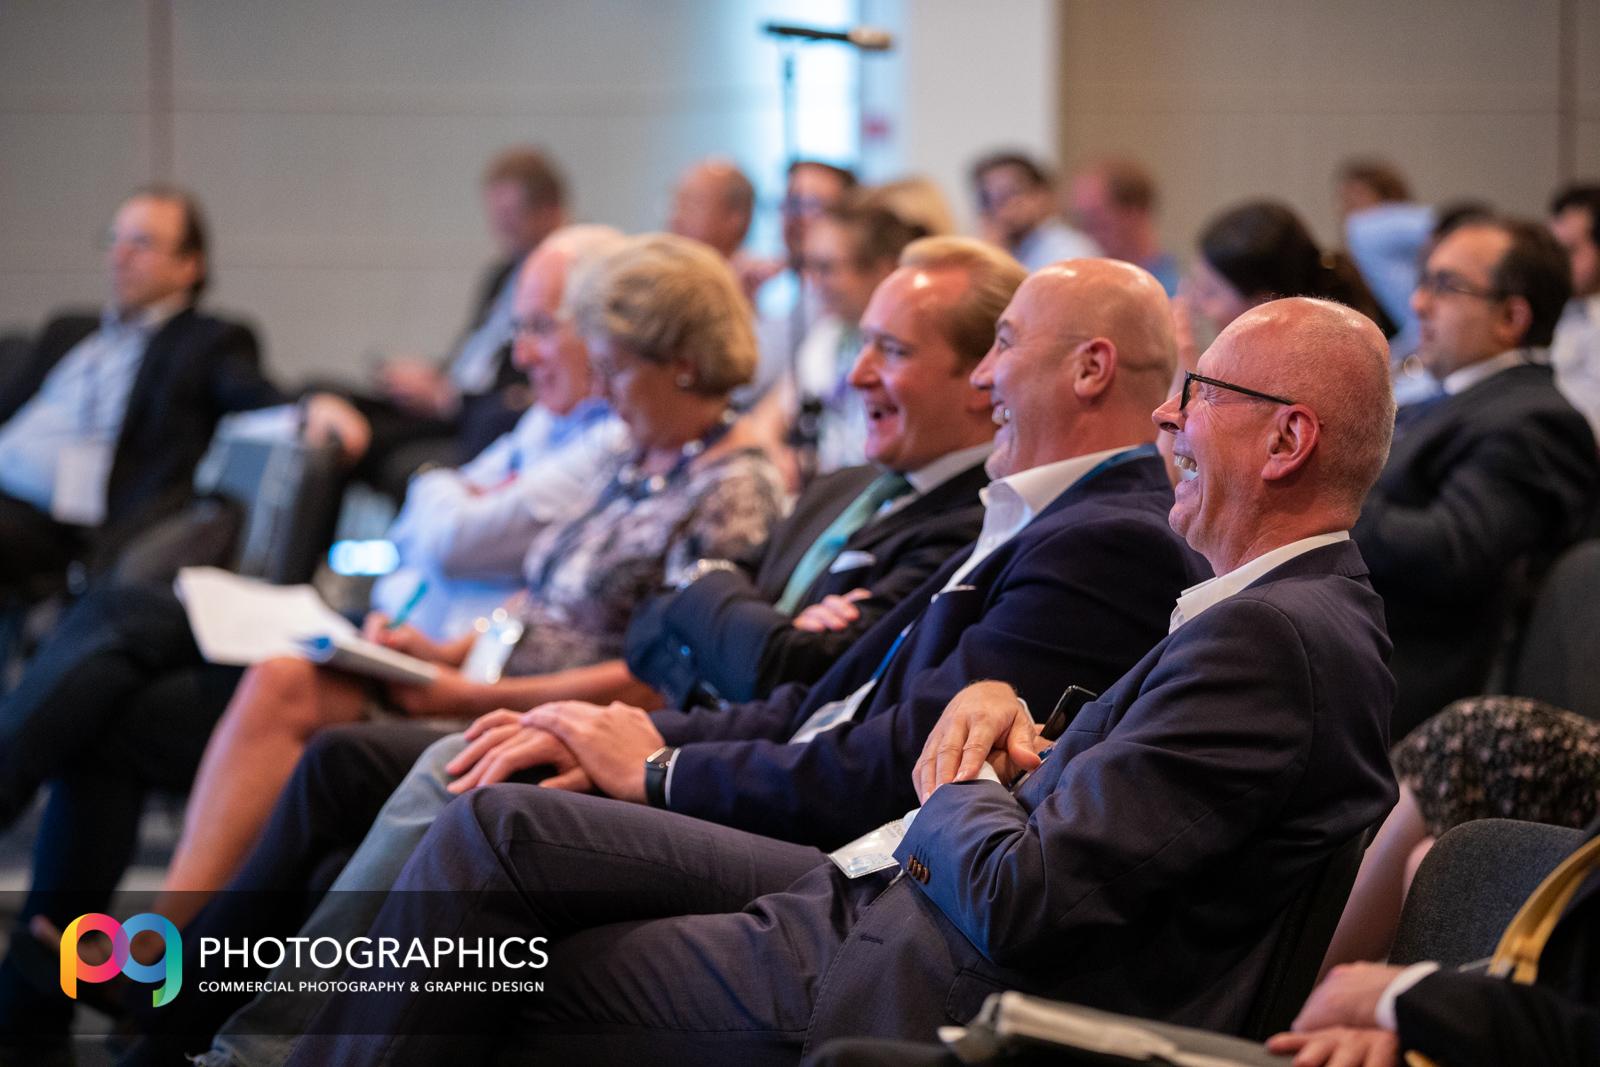 Conference-photography-edinburgh-glasgow-croatia-14.jpg